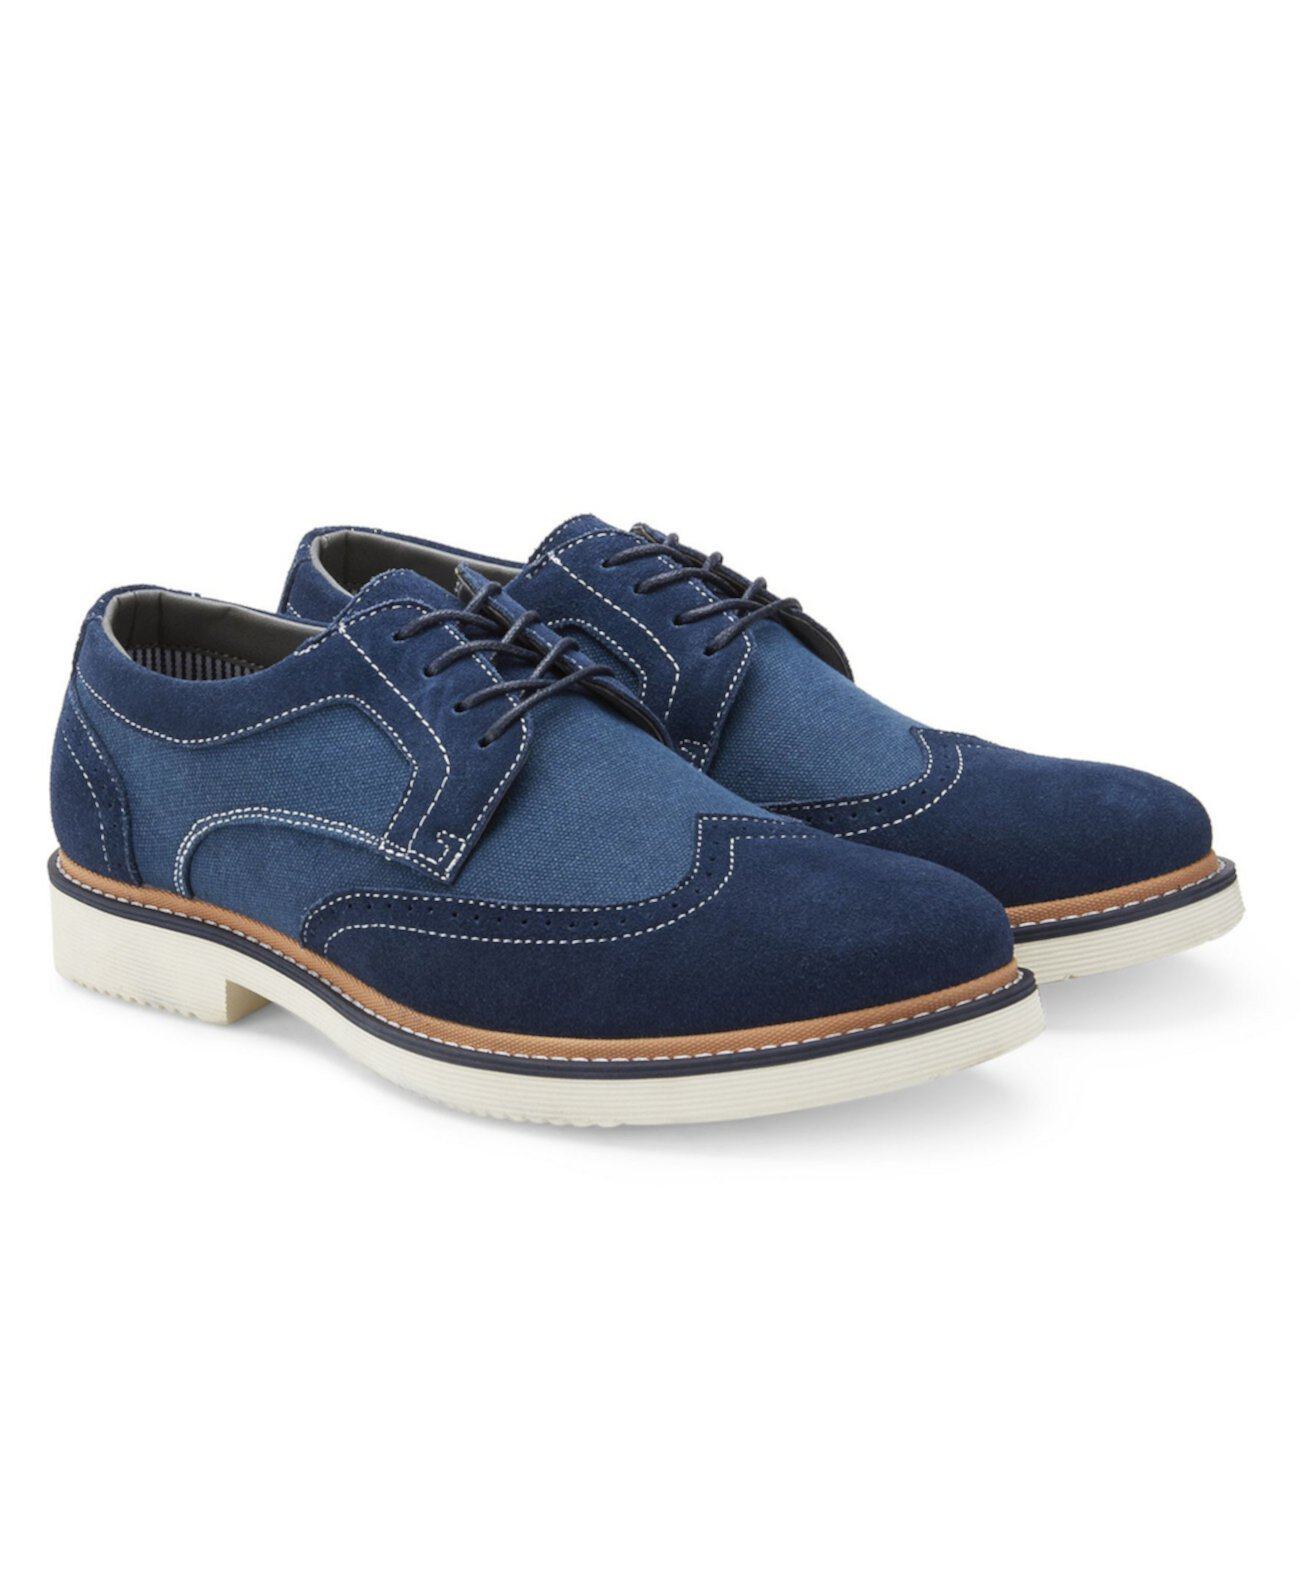 Мужчины Честер Вингтип Дерби Reserved Footwear